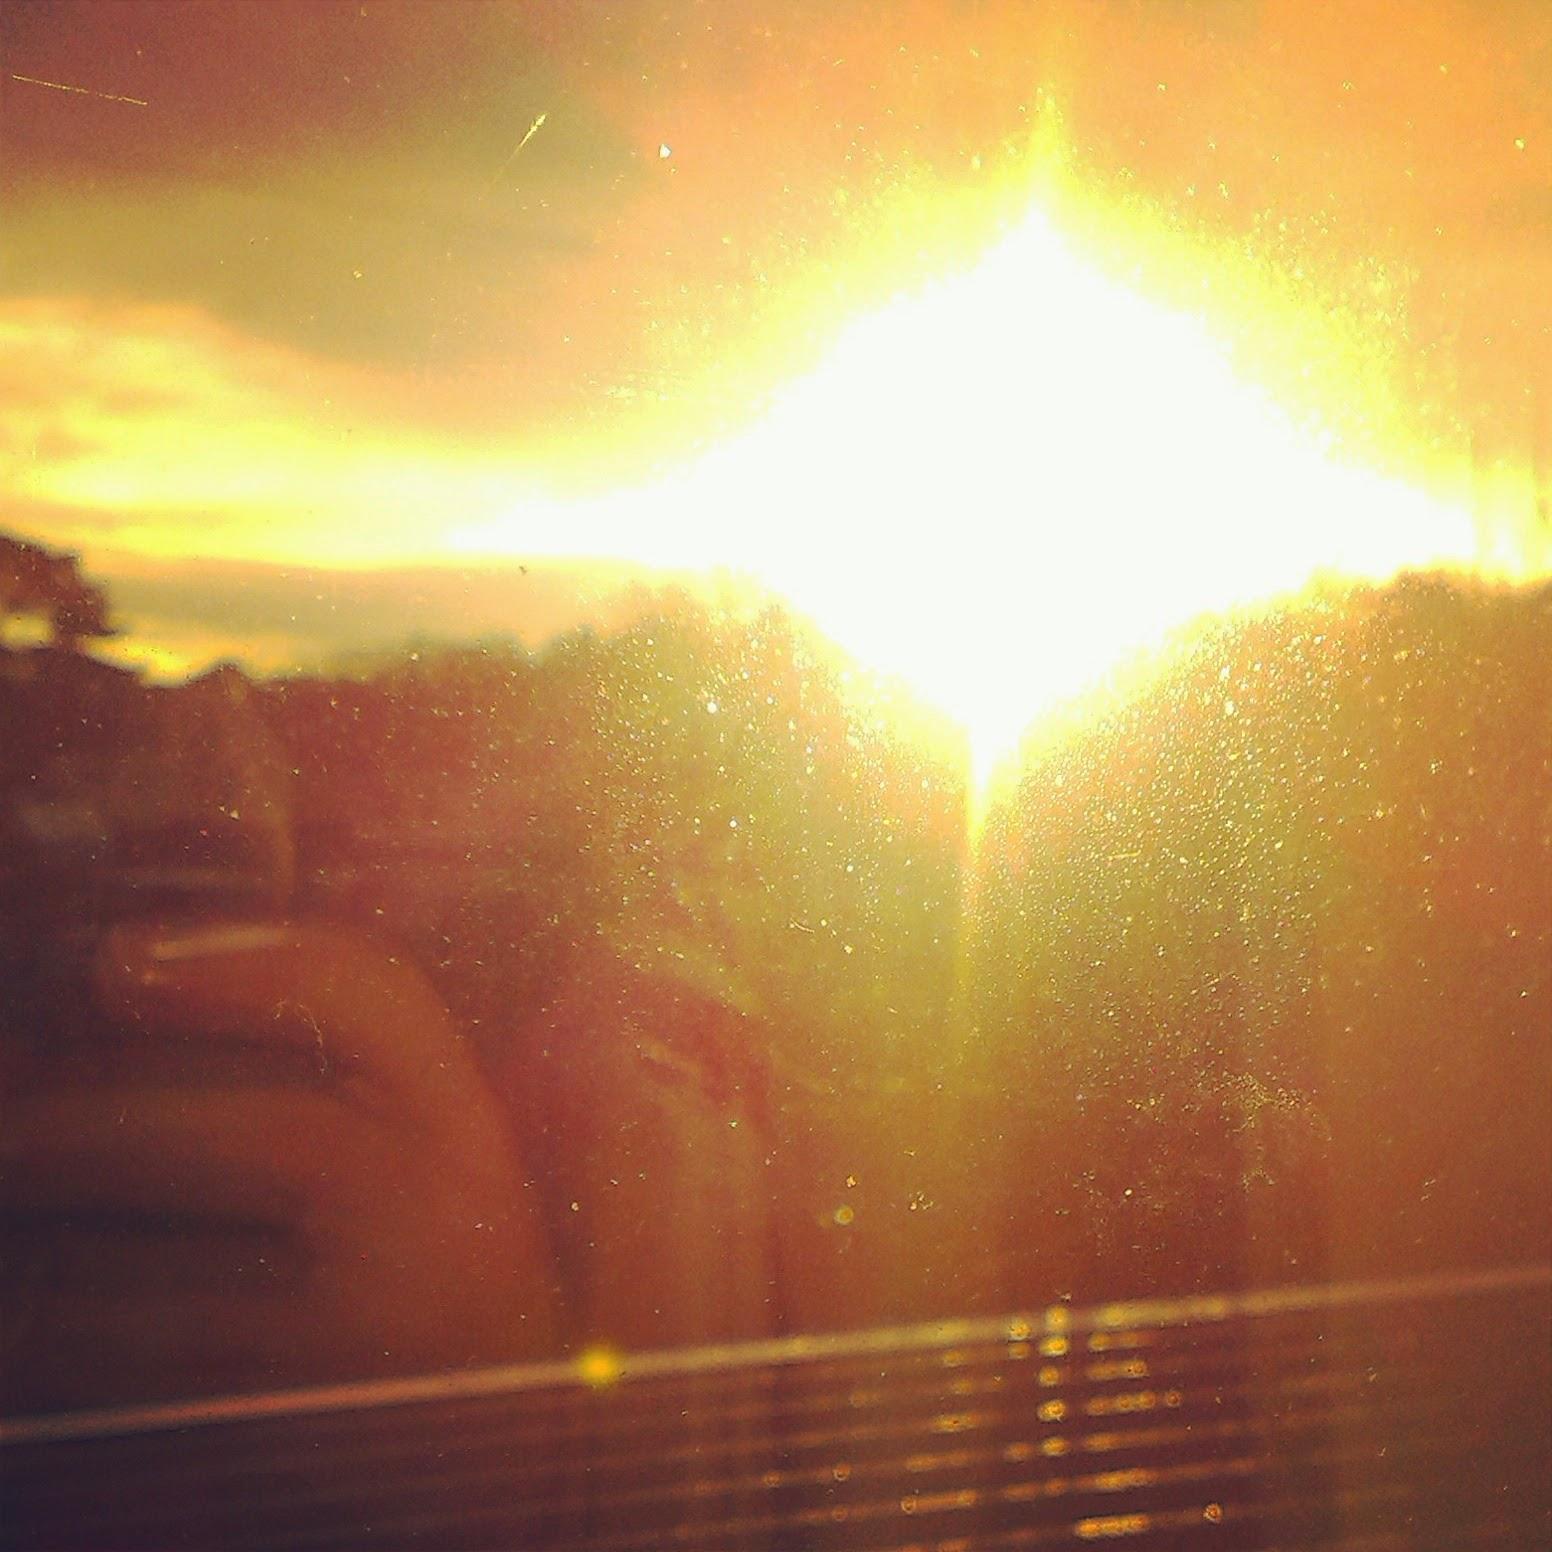 9am - sun in the morning